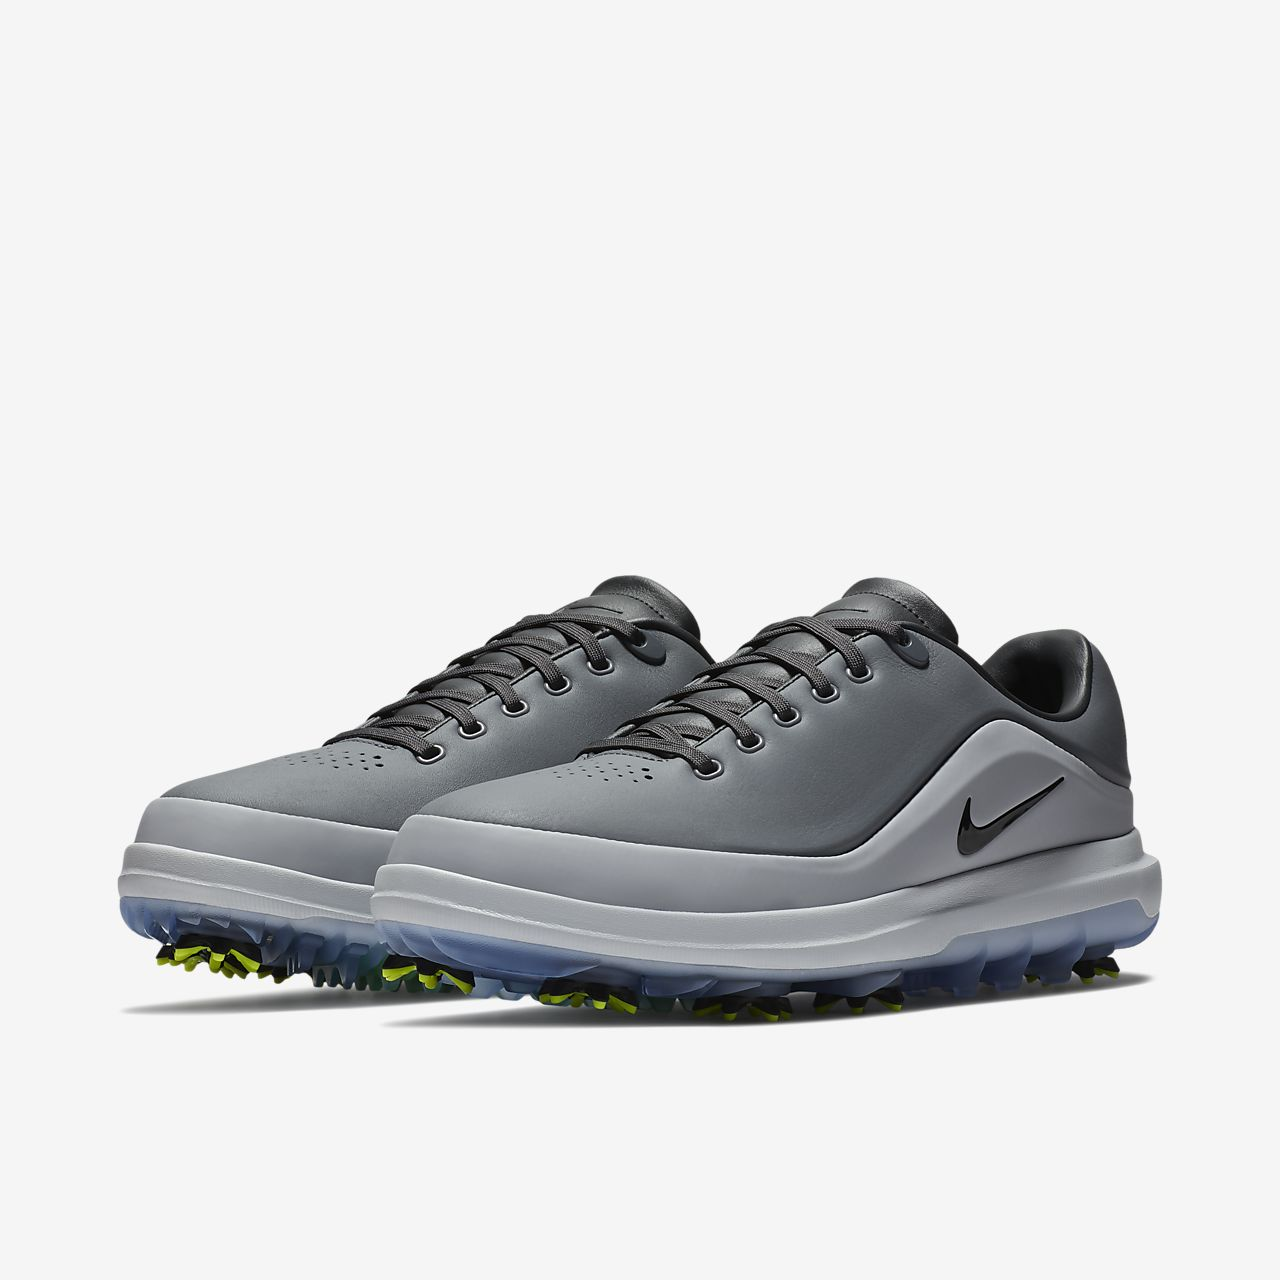 Nike Air Zoom Precision Herren-Golfschuh